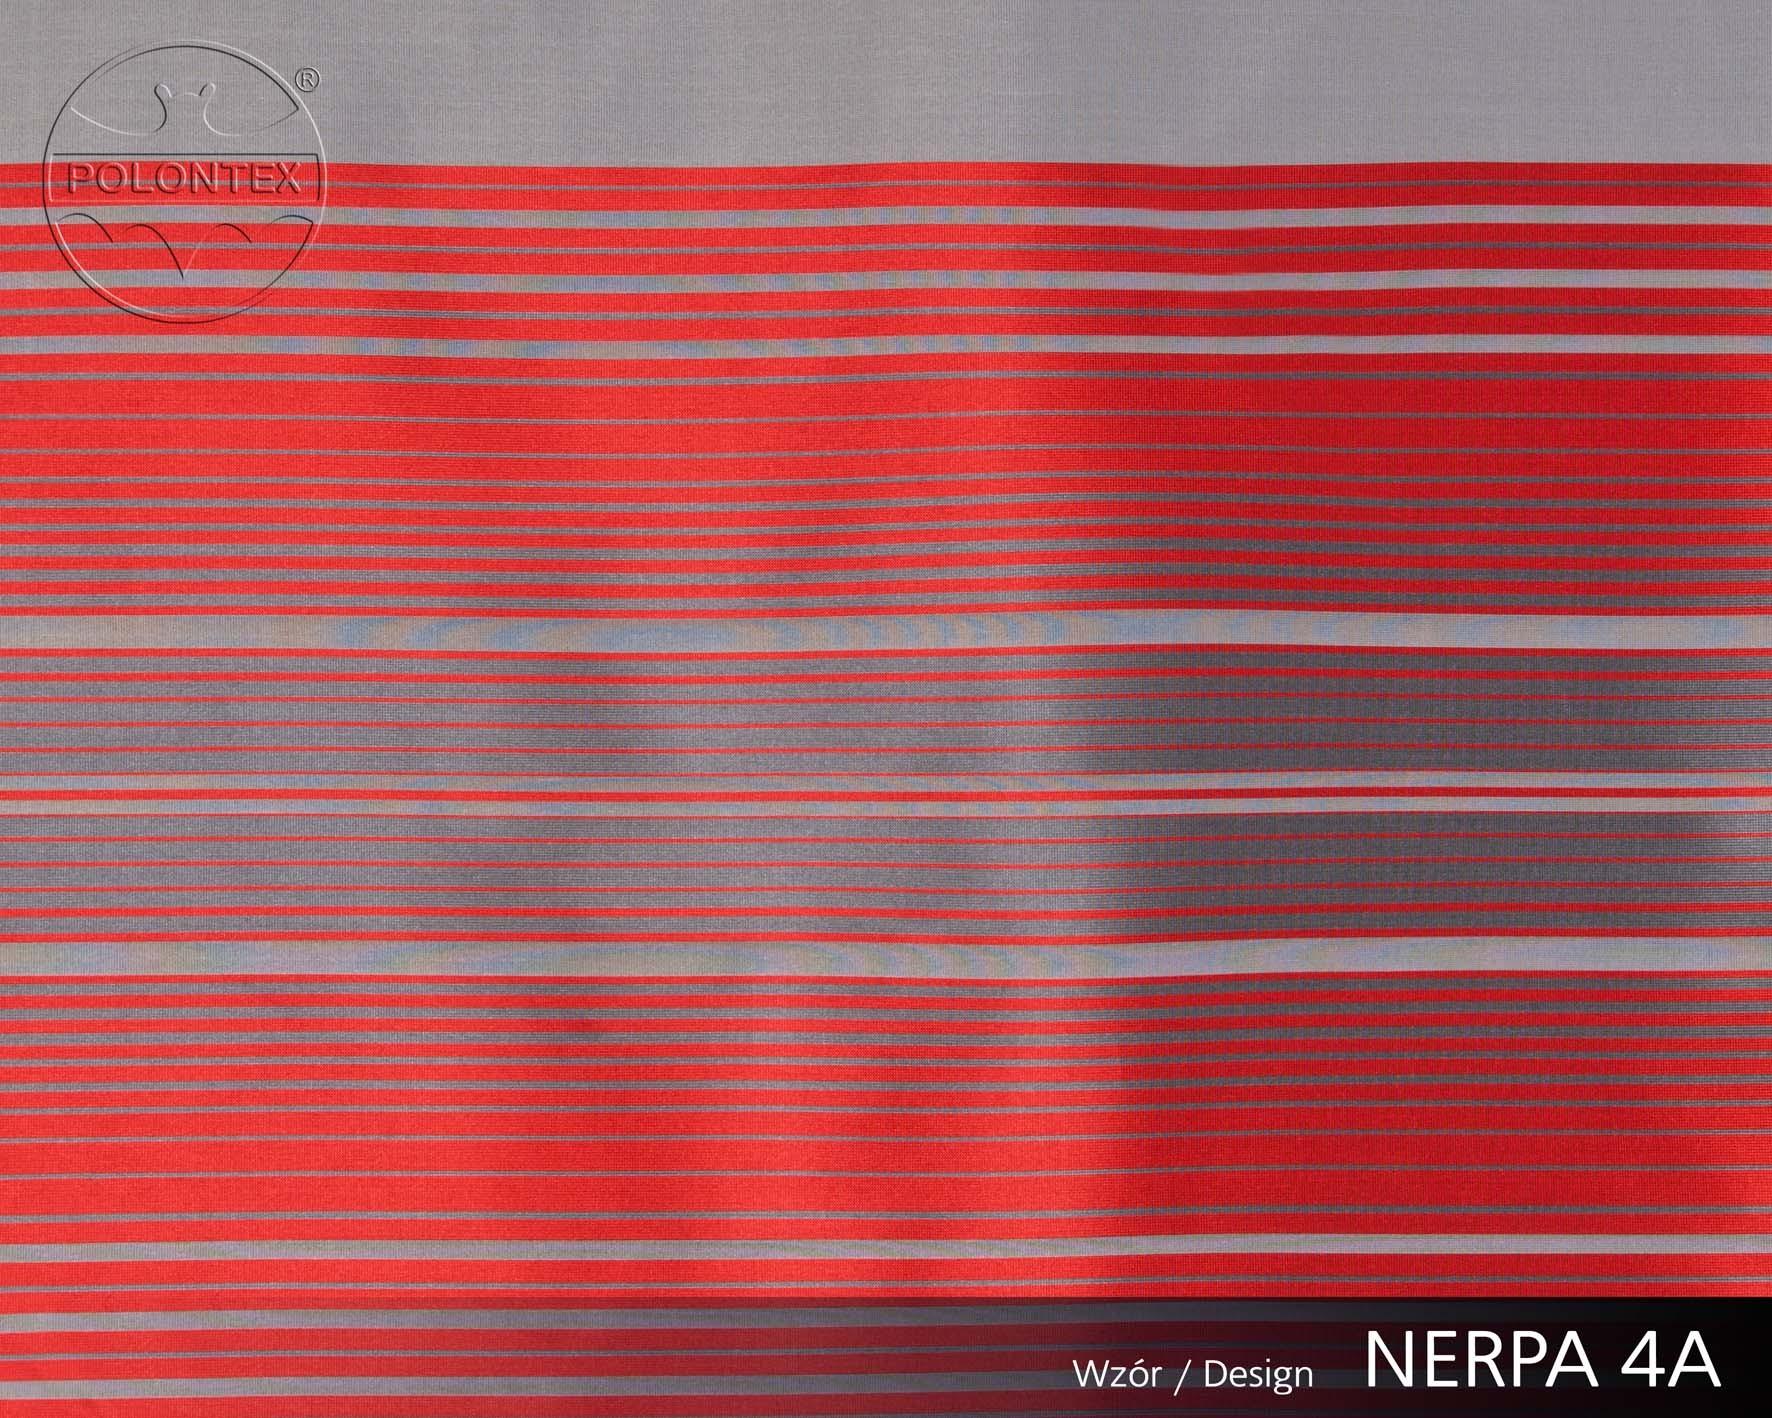 NERPA A255